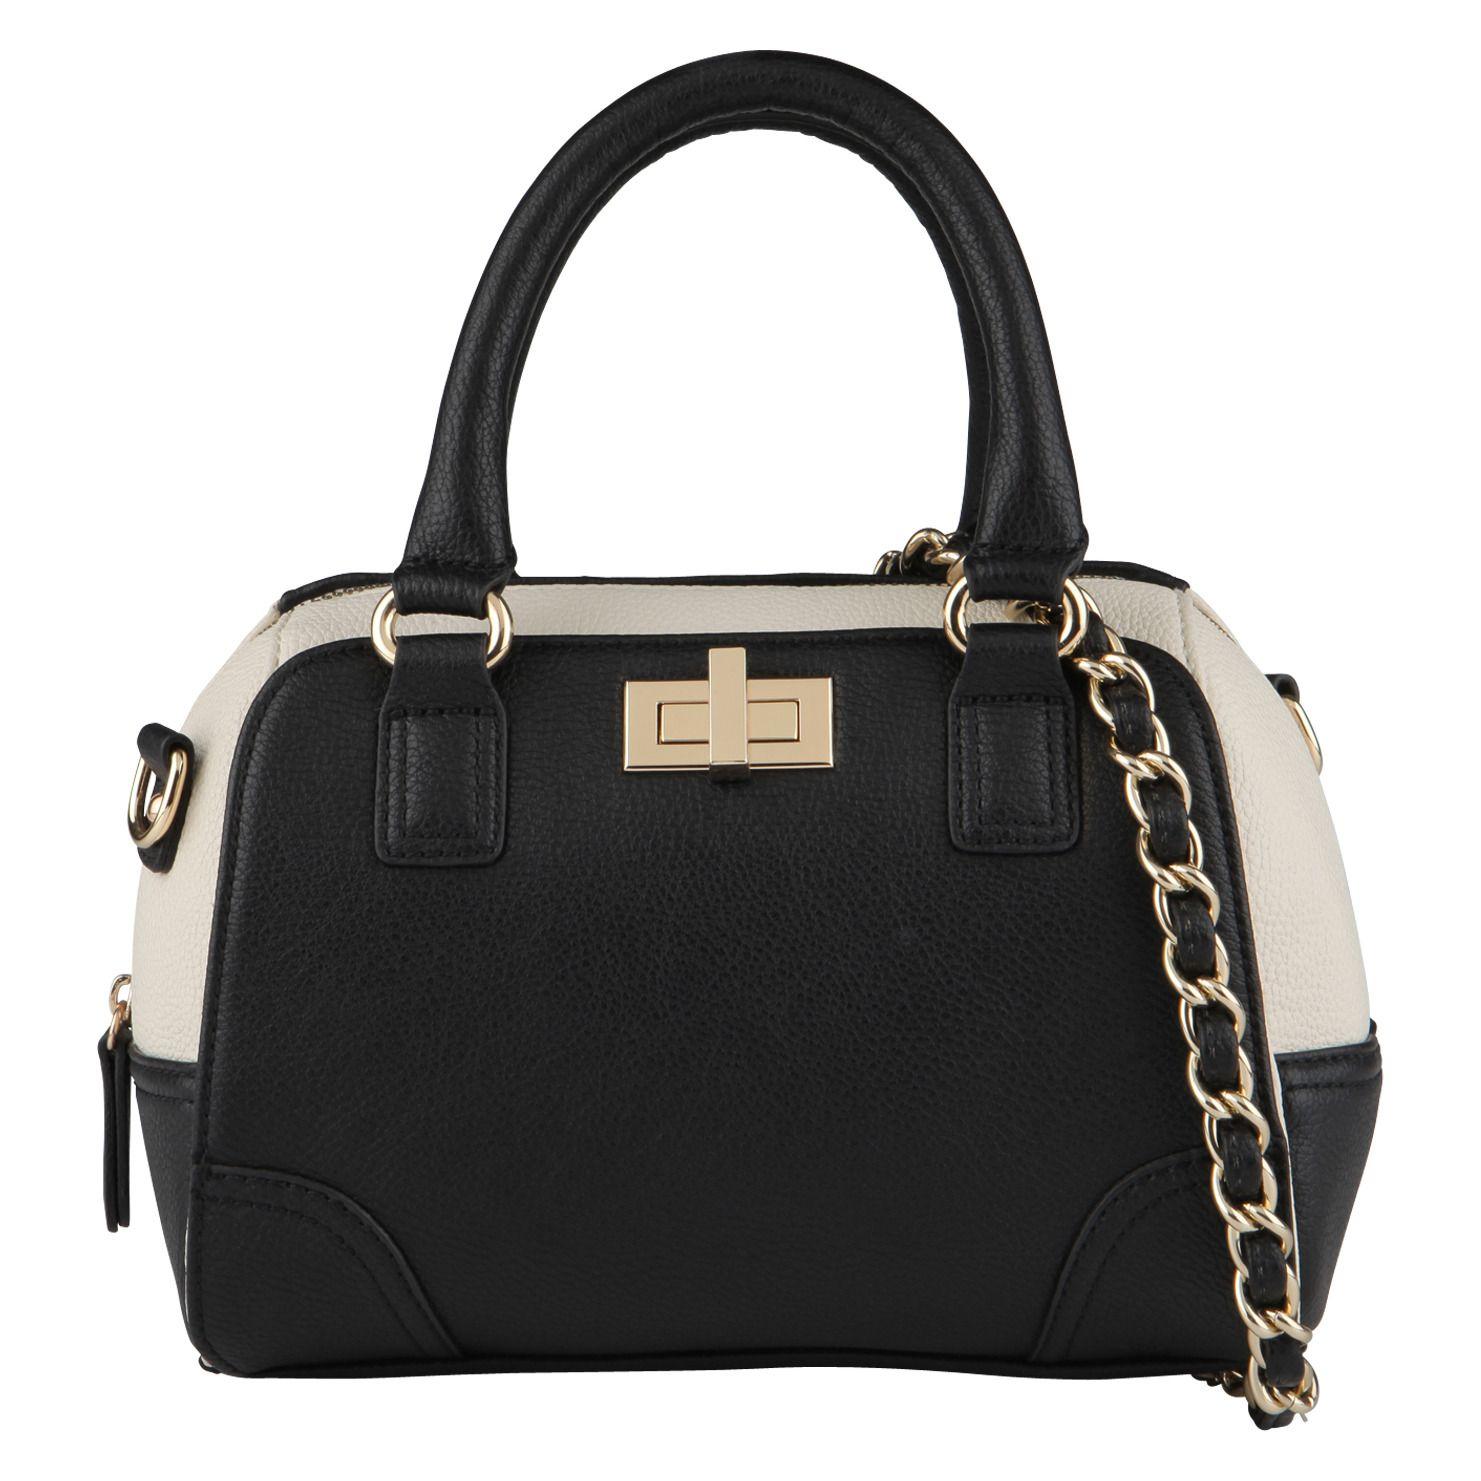 CALLER - handbags's satchels & handheld bags for sale at ALDO ...